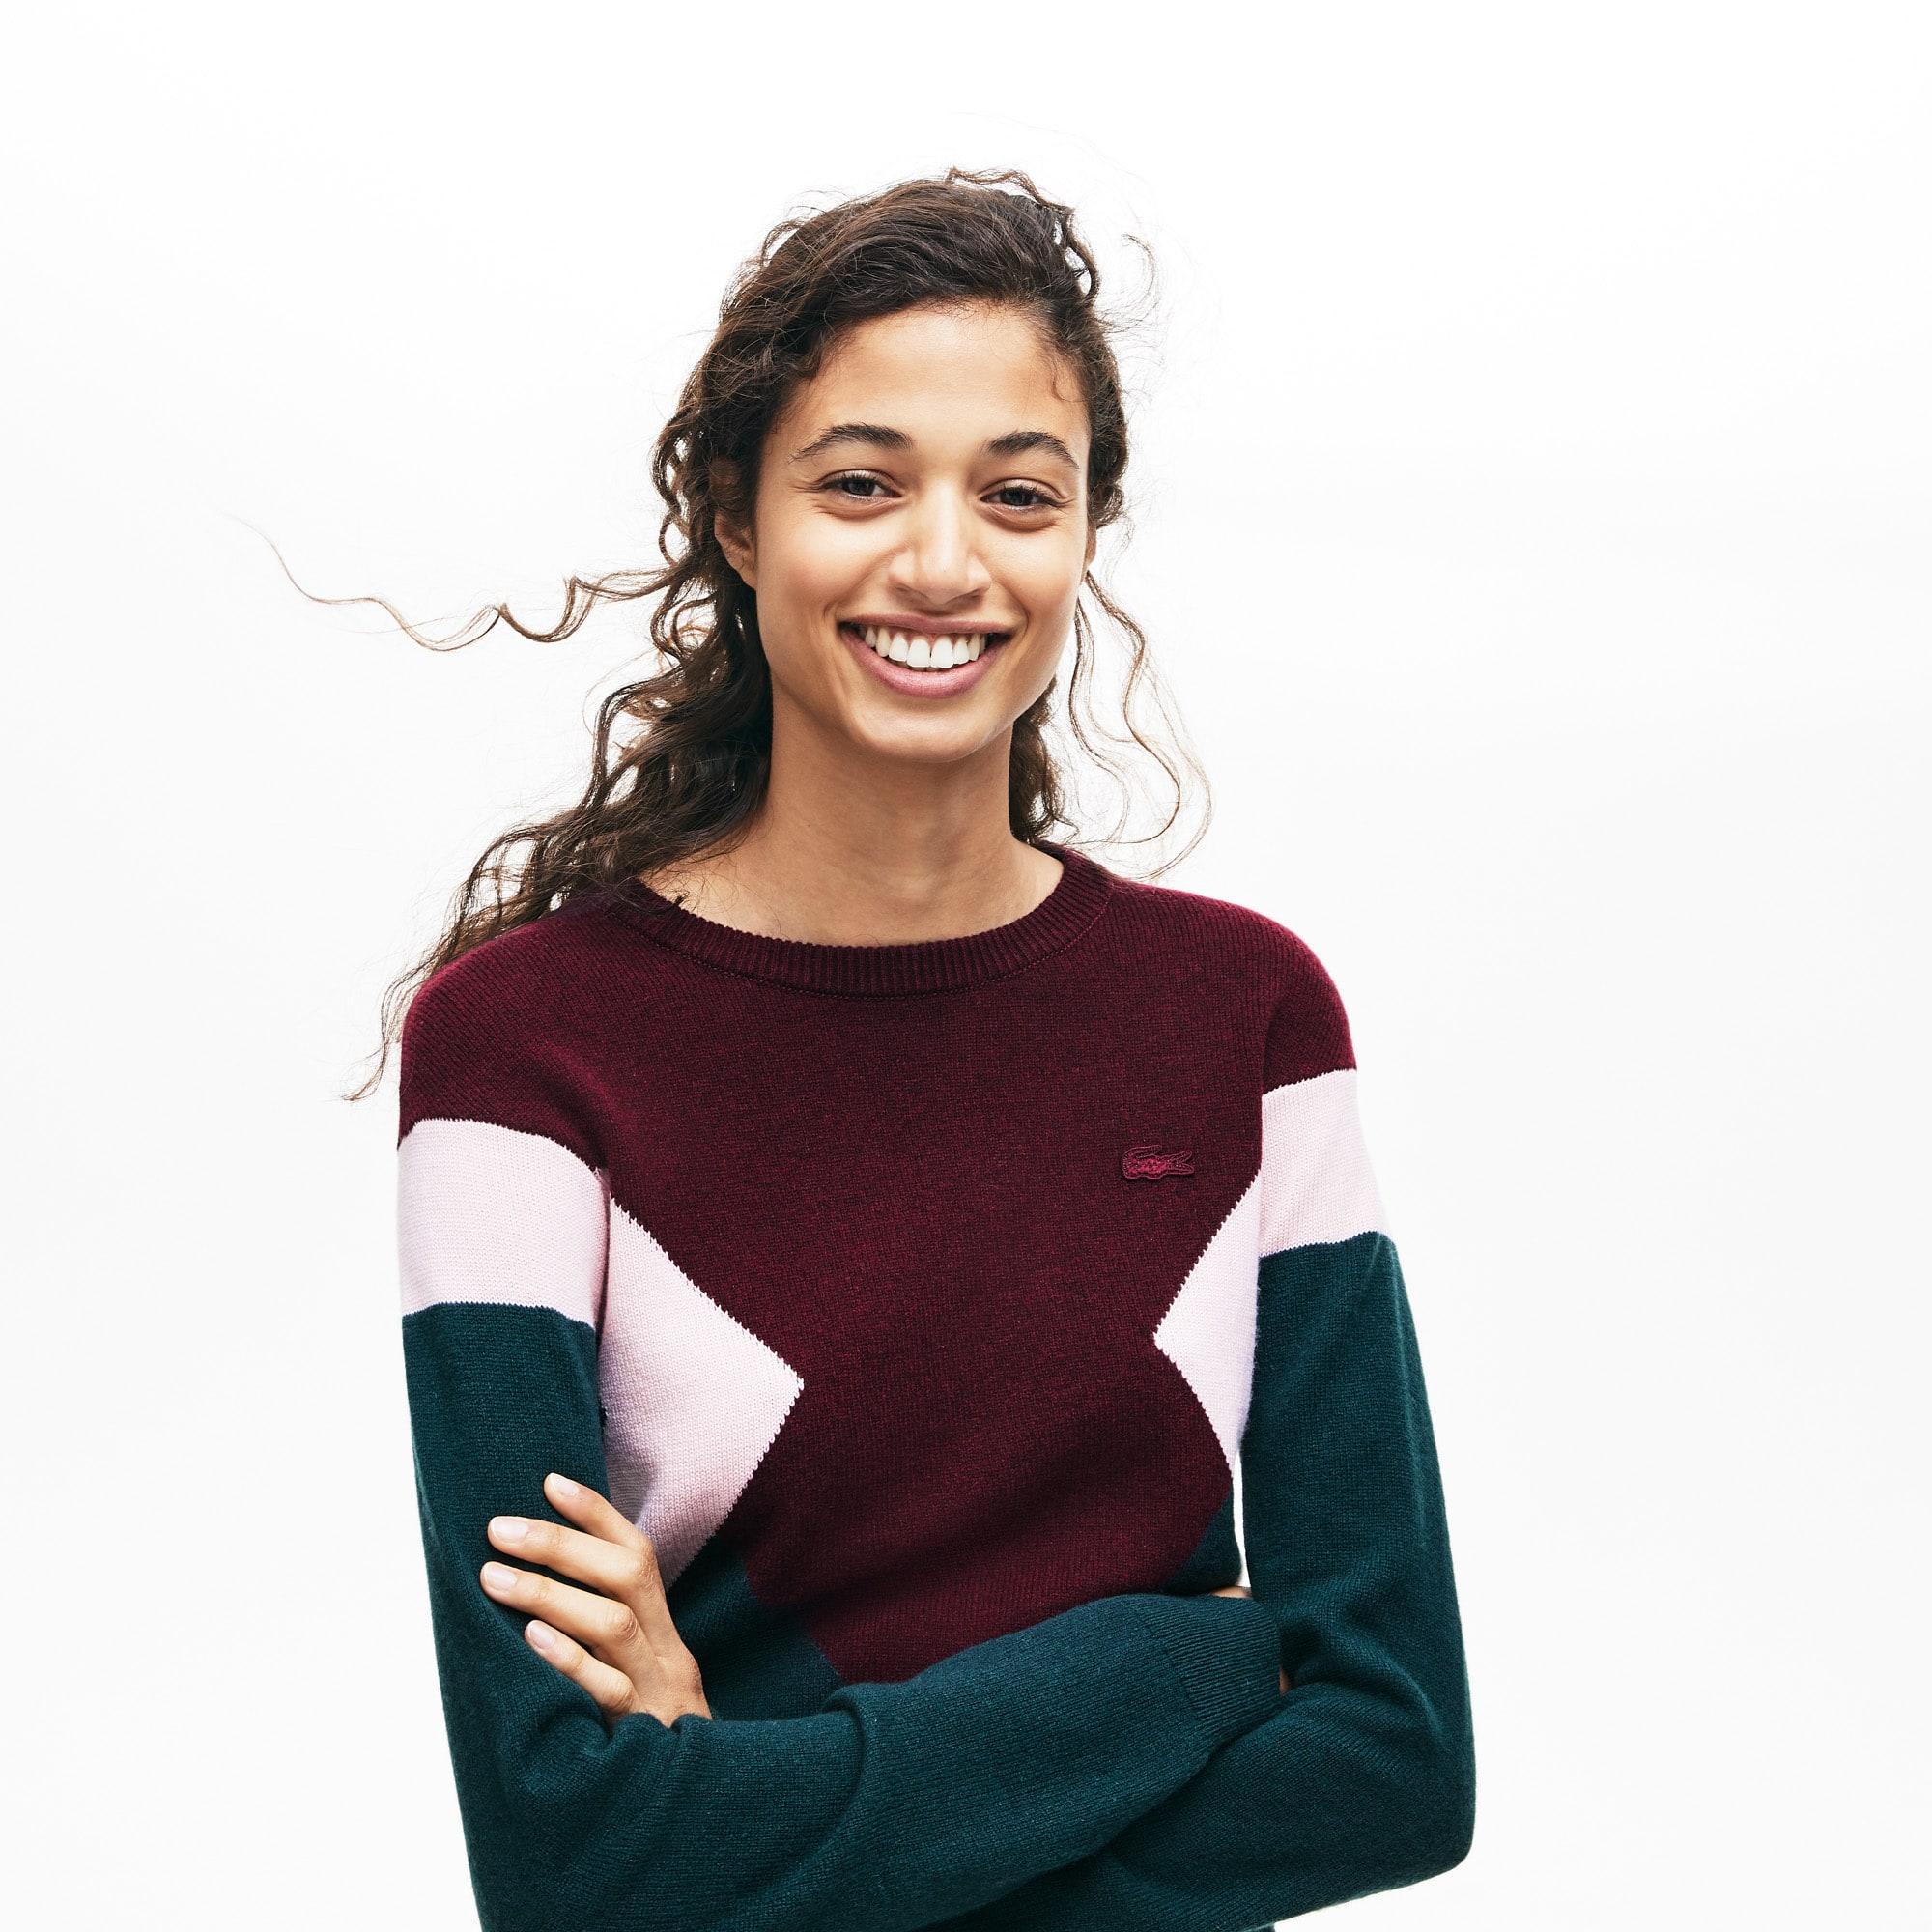 Lacoste Tops Women's Multi Color Design Sweater